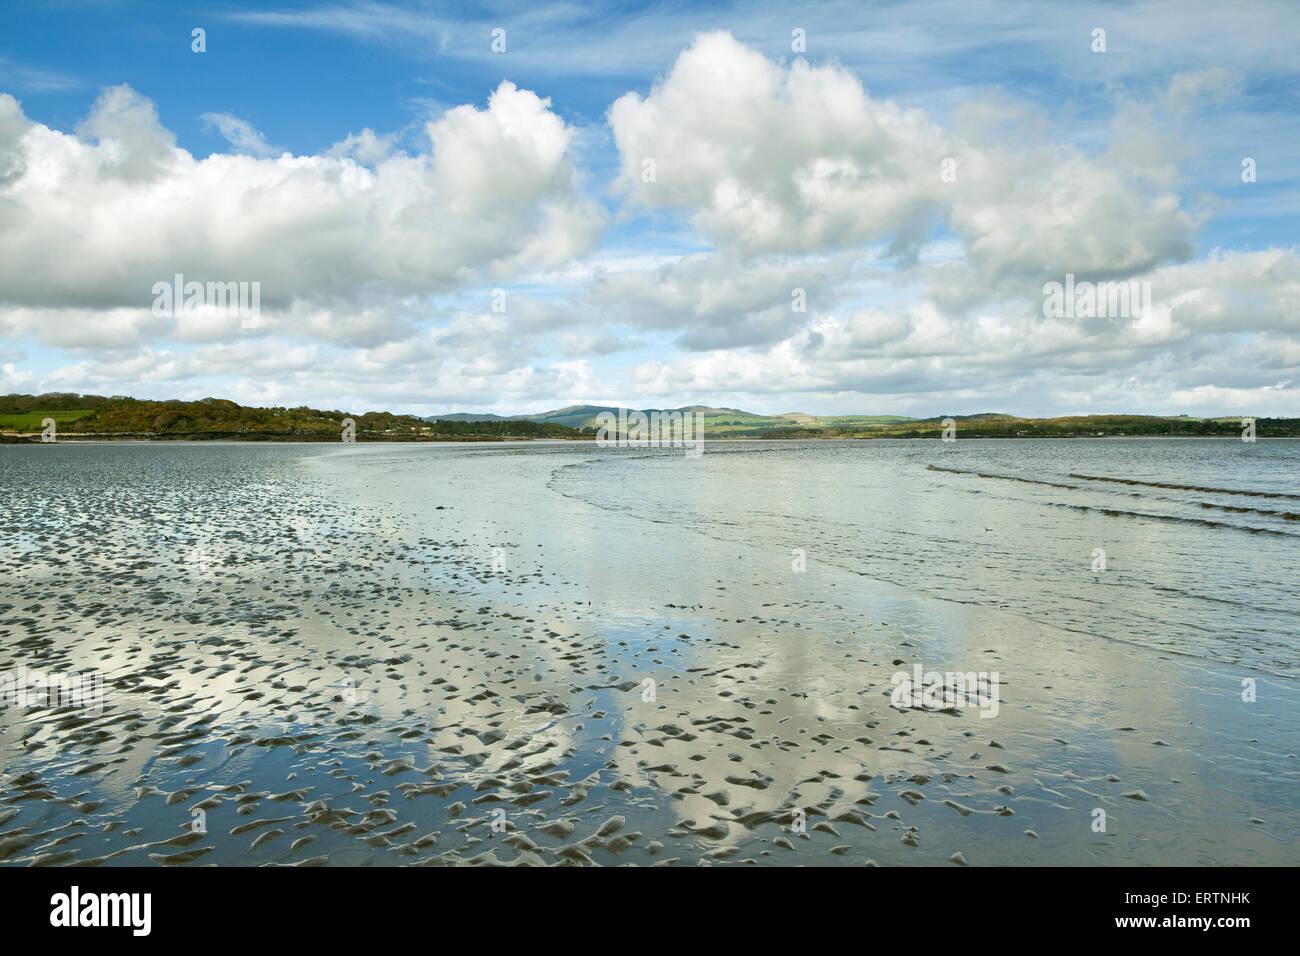 Fair weather cloud over the beach at Mossyard on Fleet Bay near Gatehouse of Fleet, Dumfries and Galloway, Scotland - Stock Image